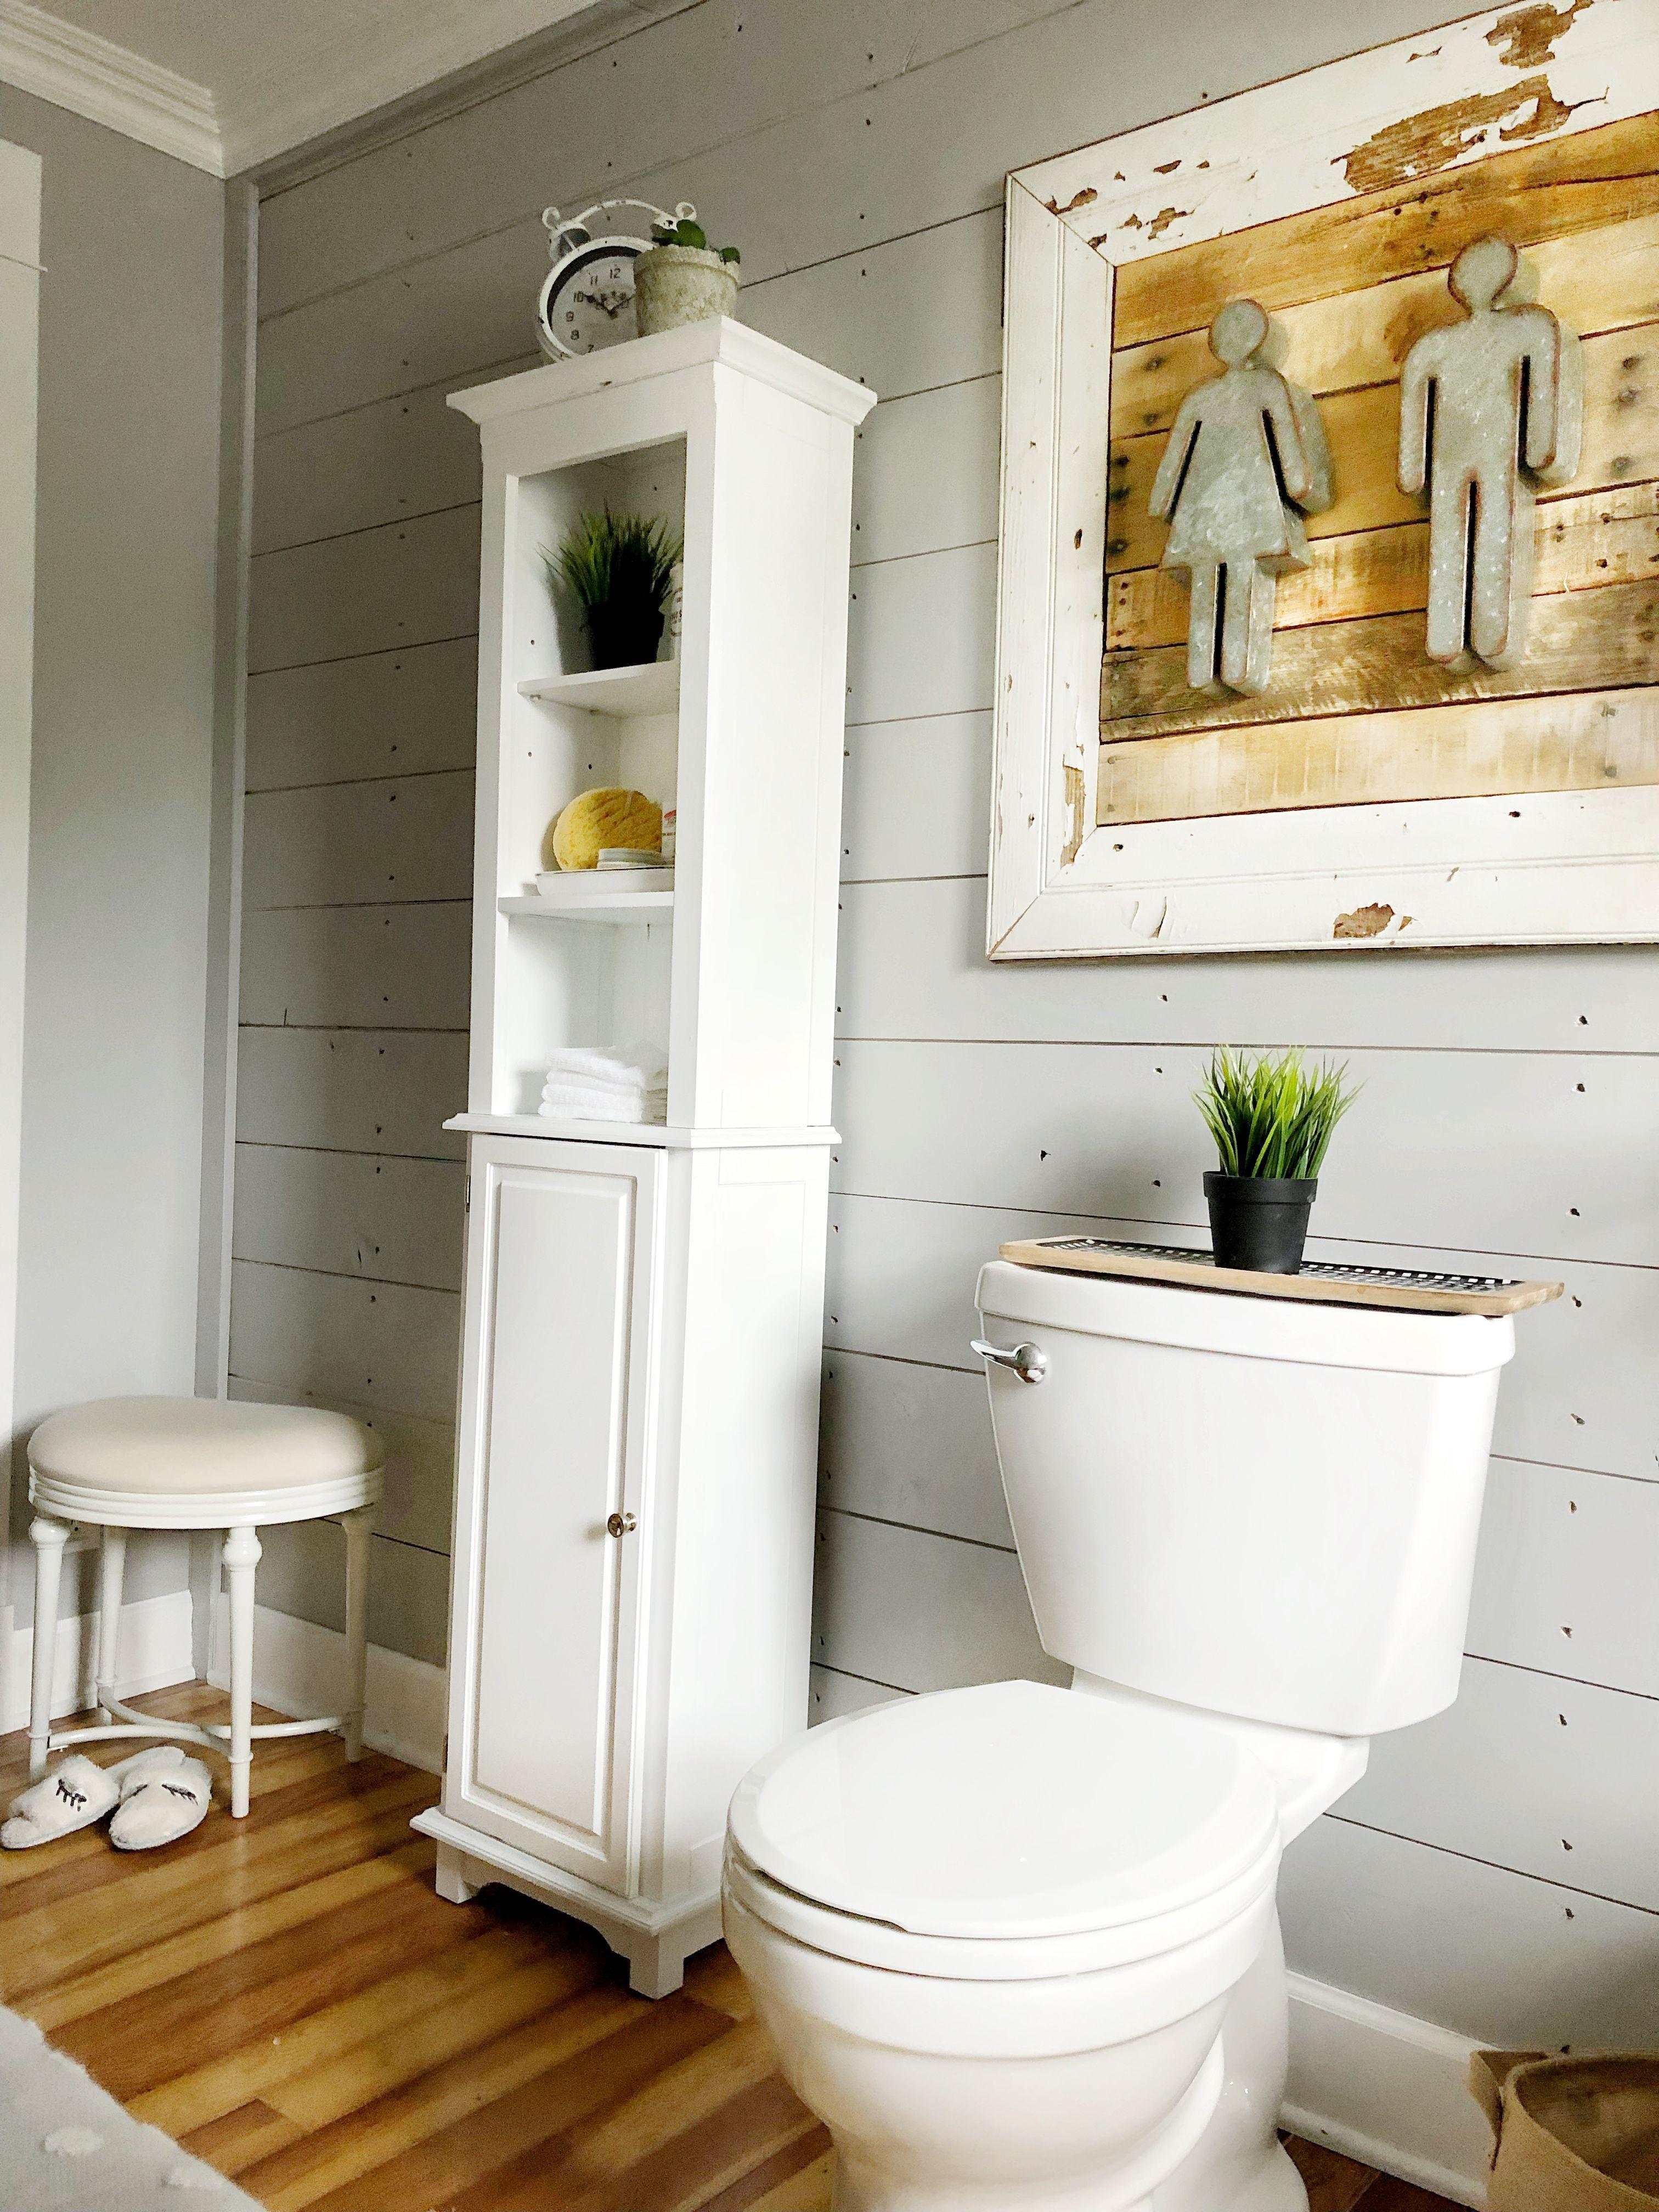 Bathroom Remodel With Bed Bath Beyond Walk In Shower Designs